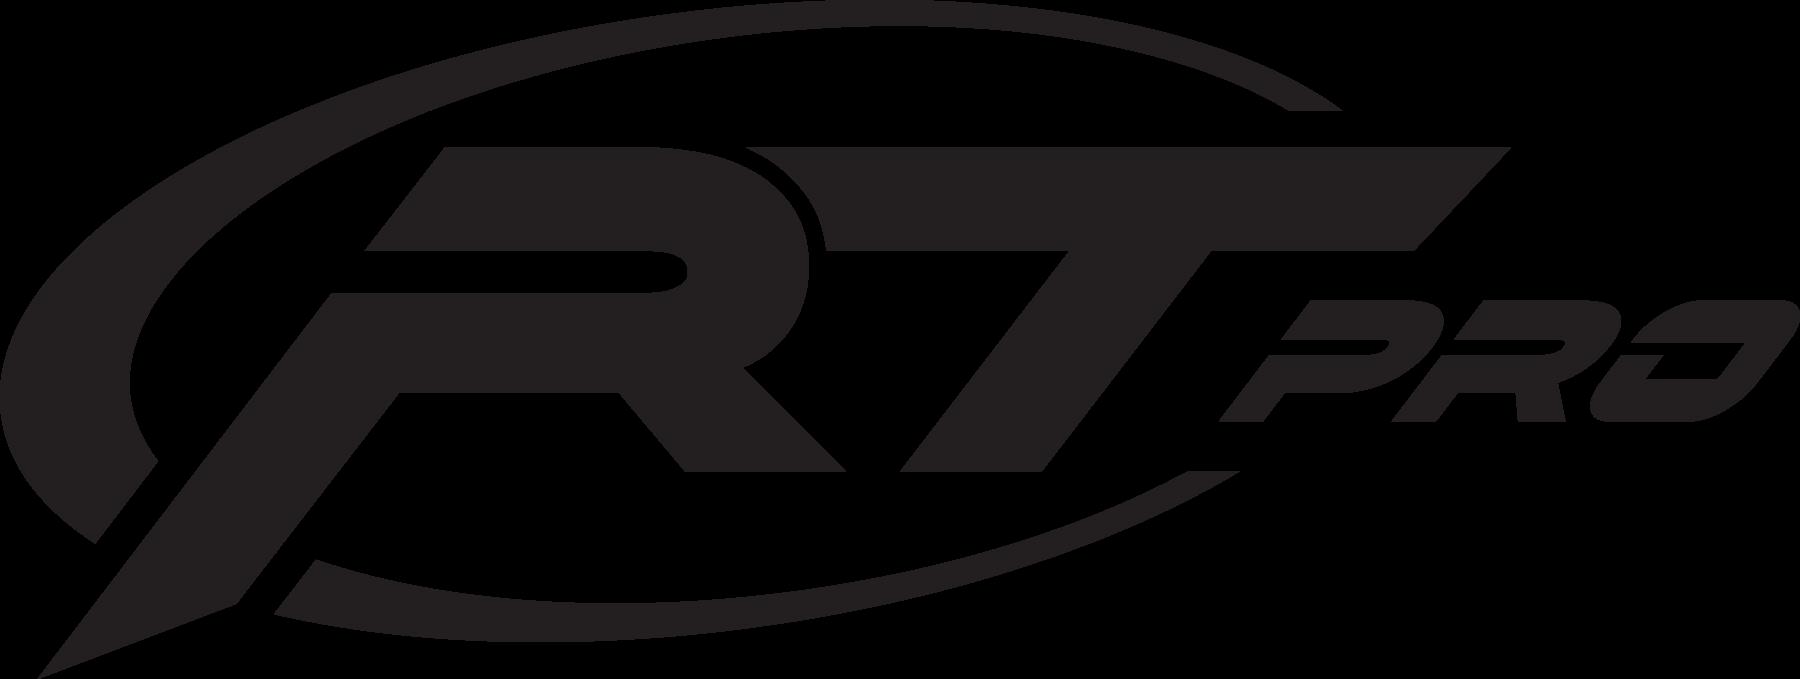 RTP-3a-black